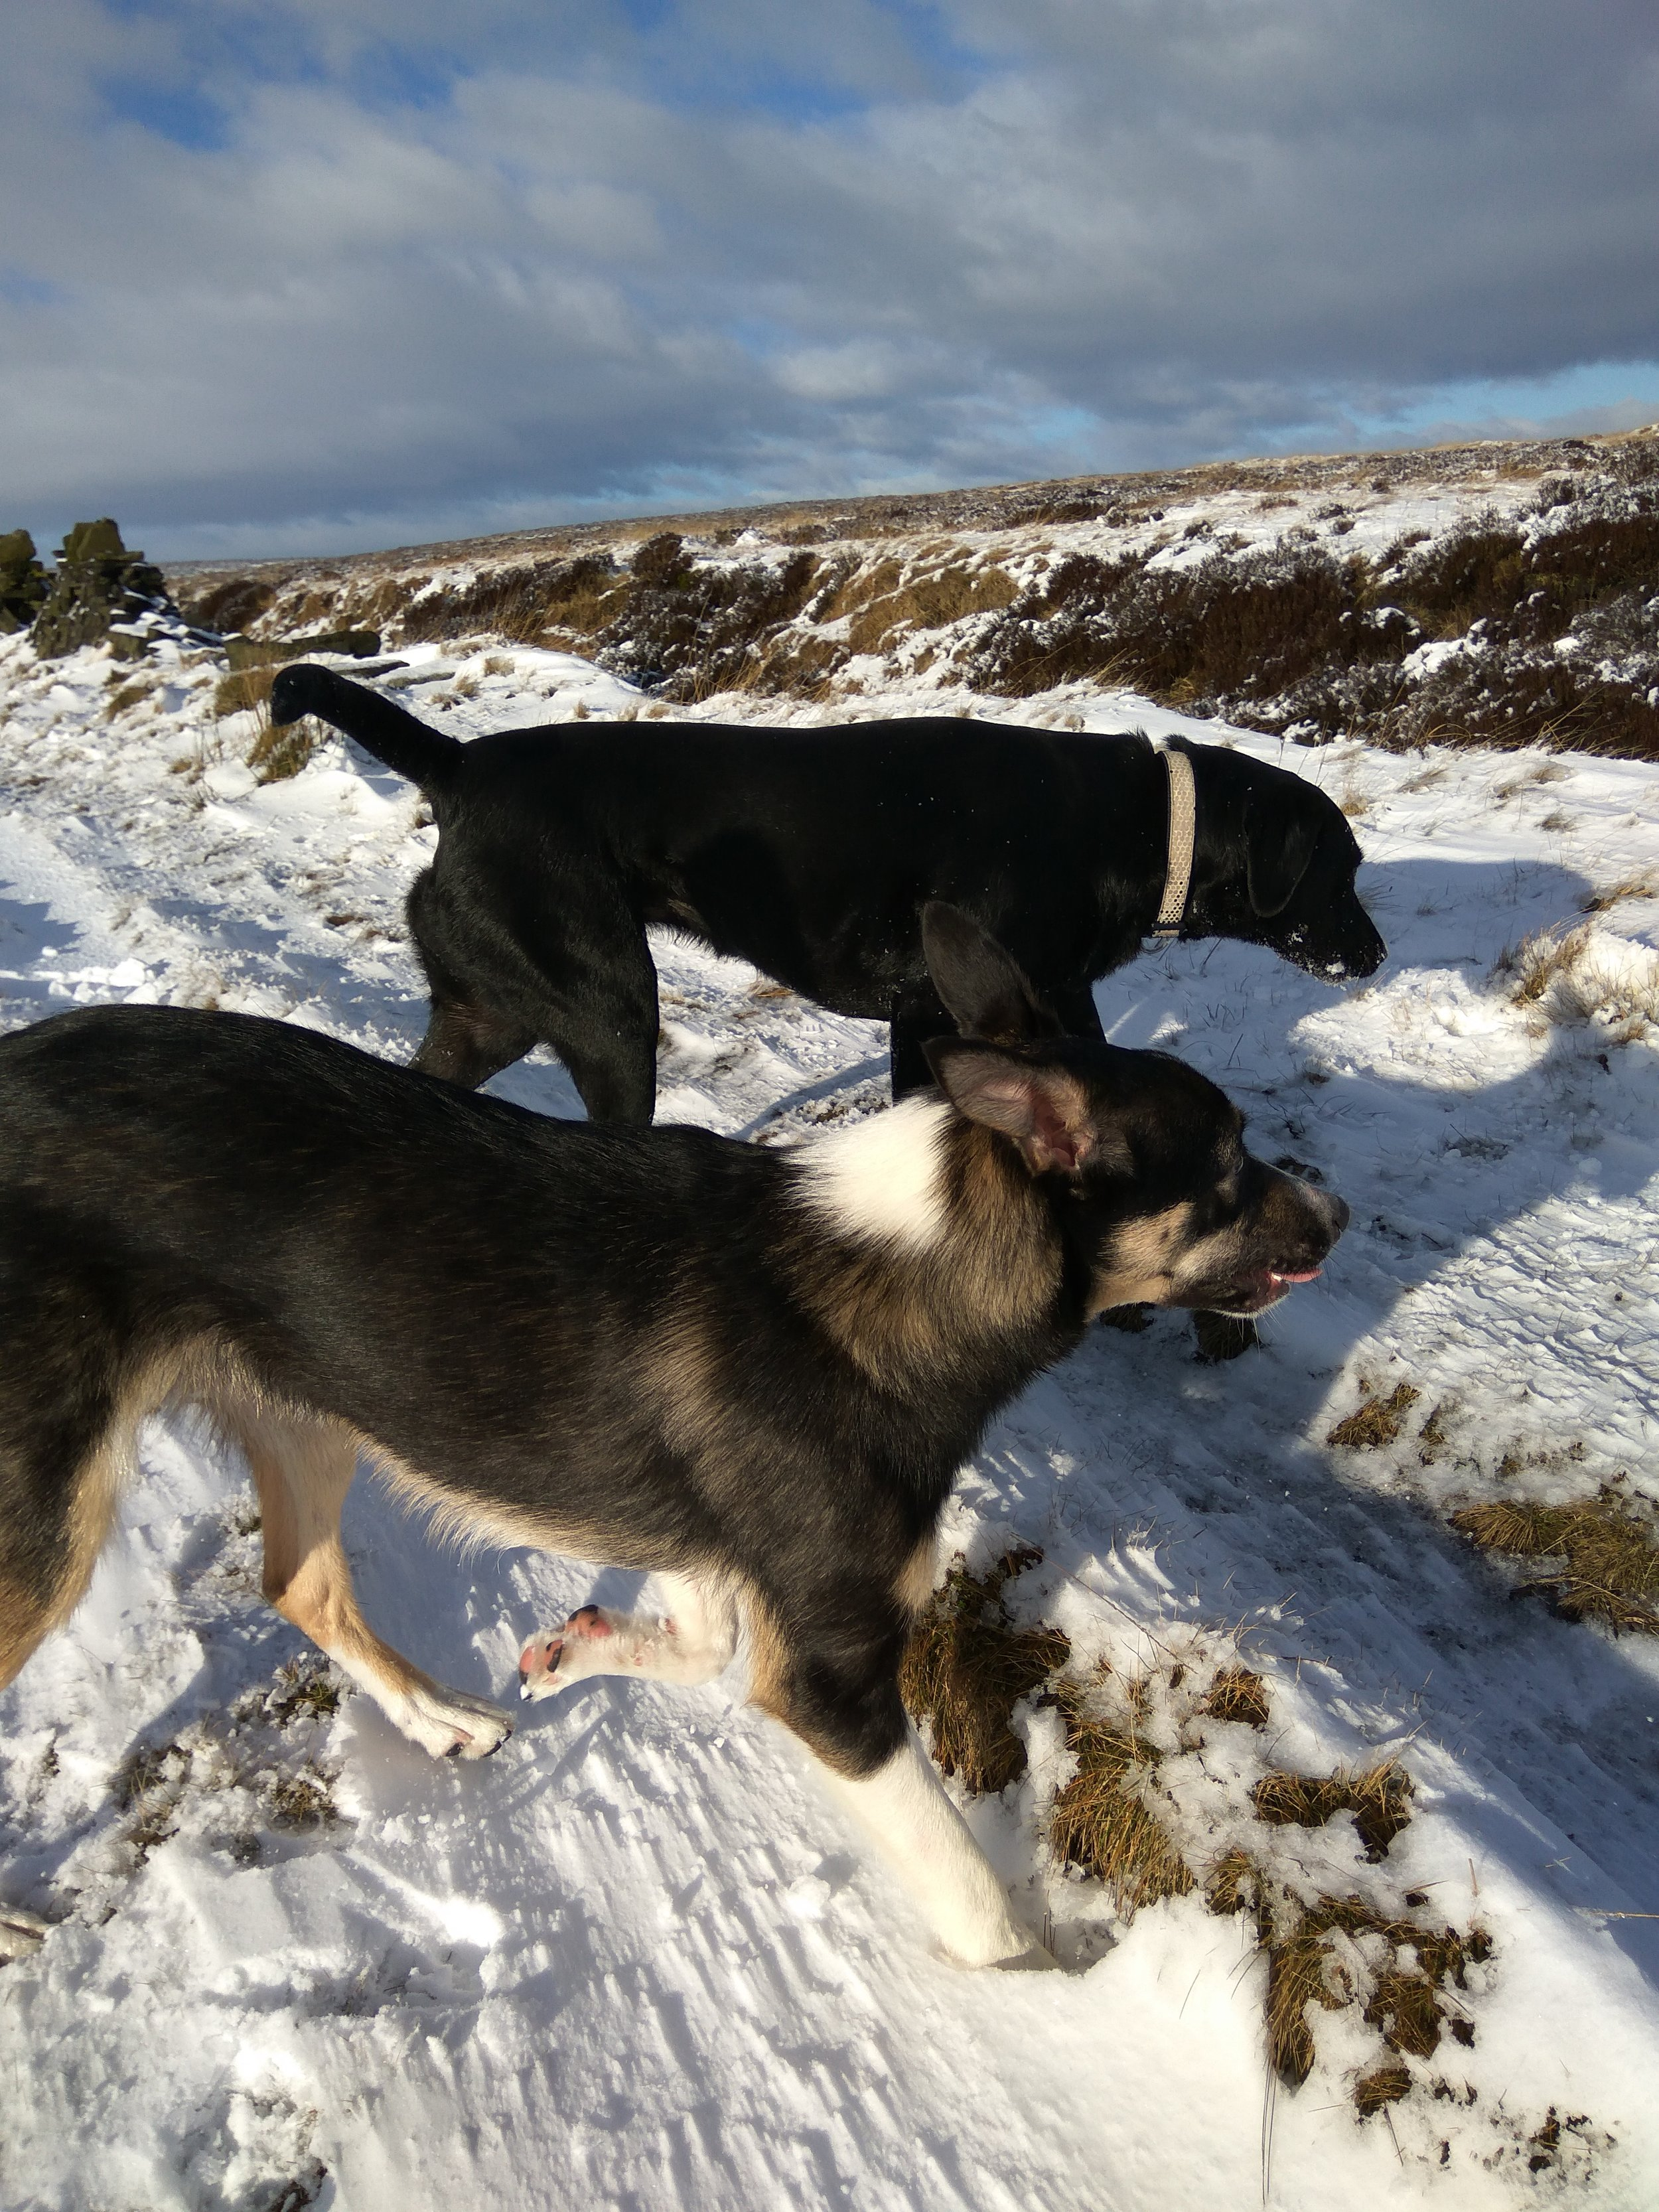 Very windy on the dog walk